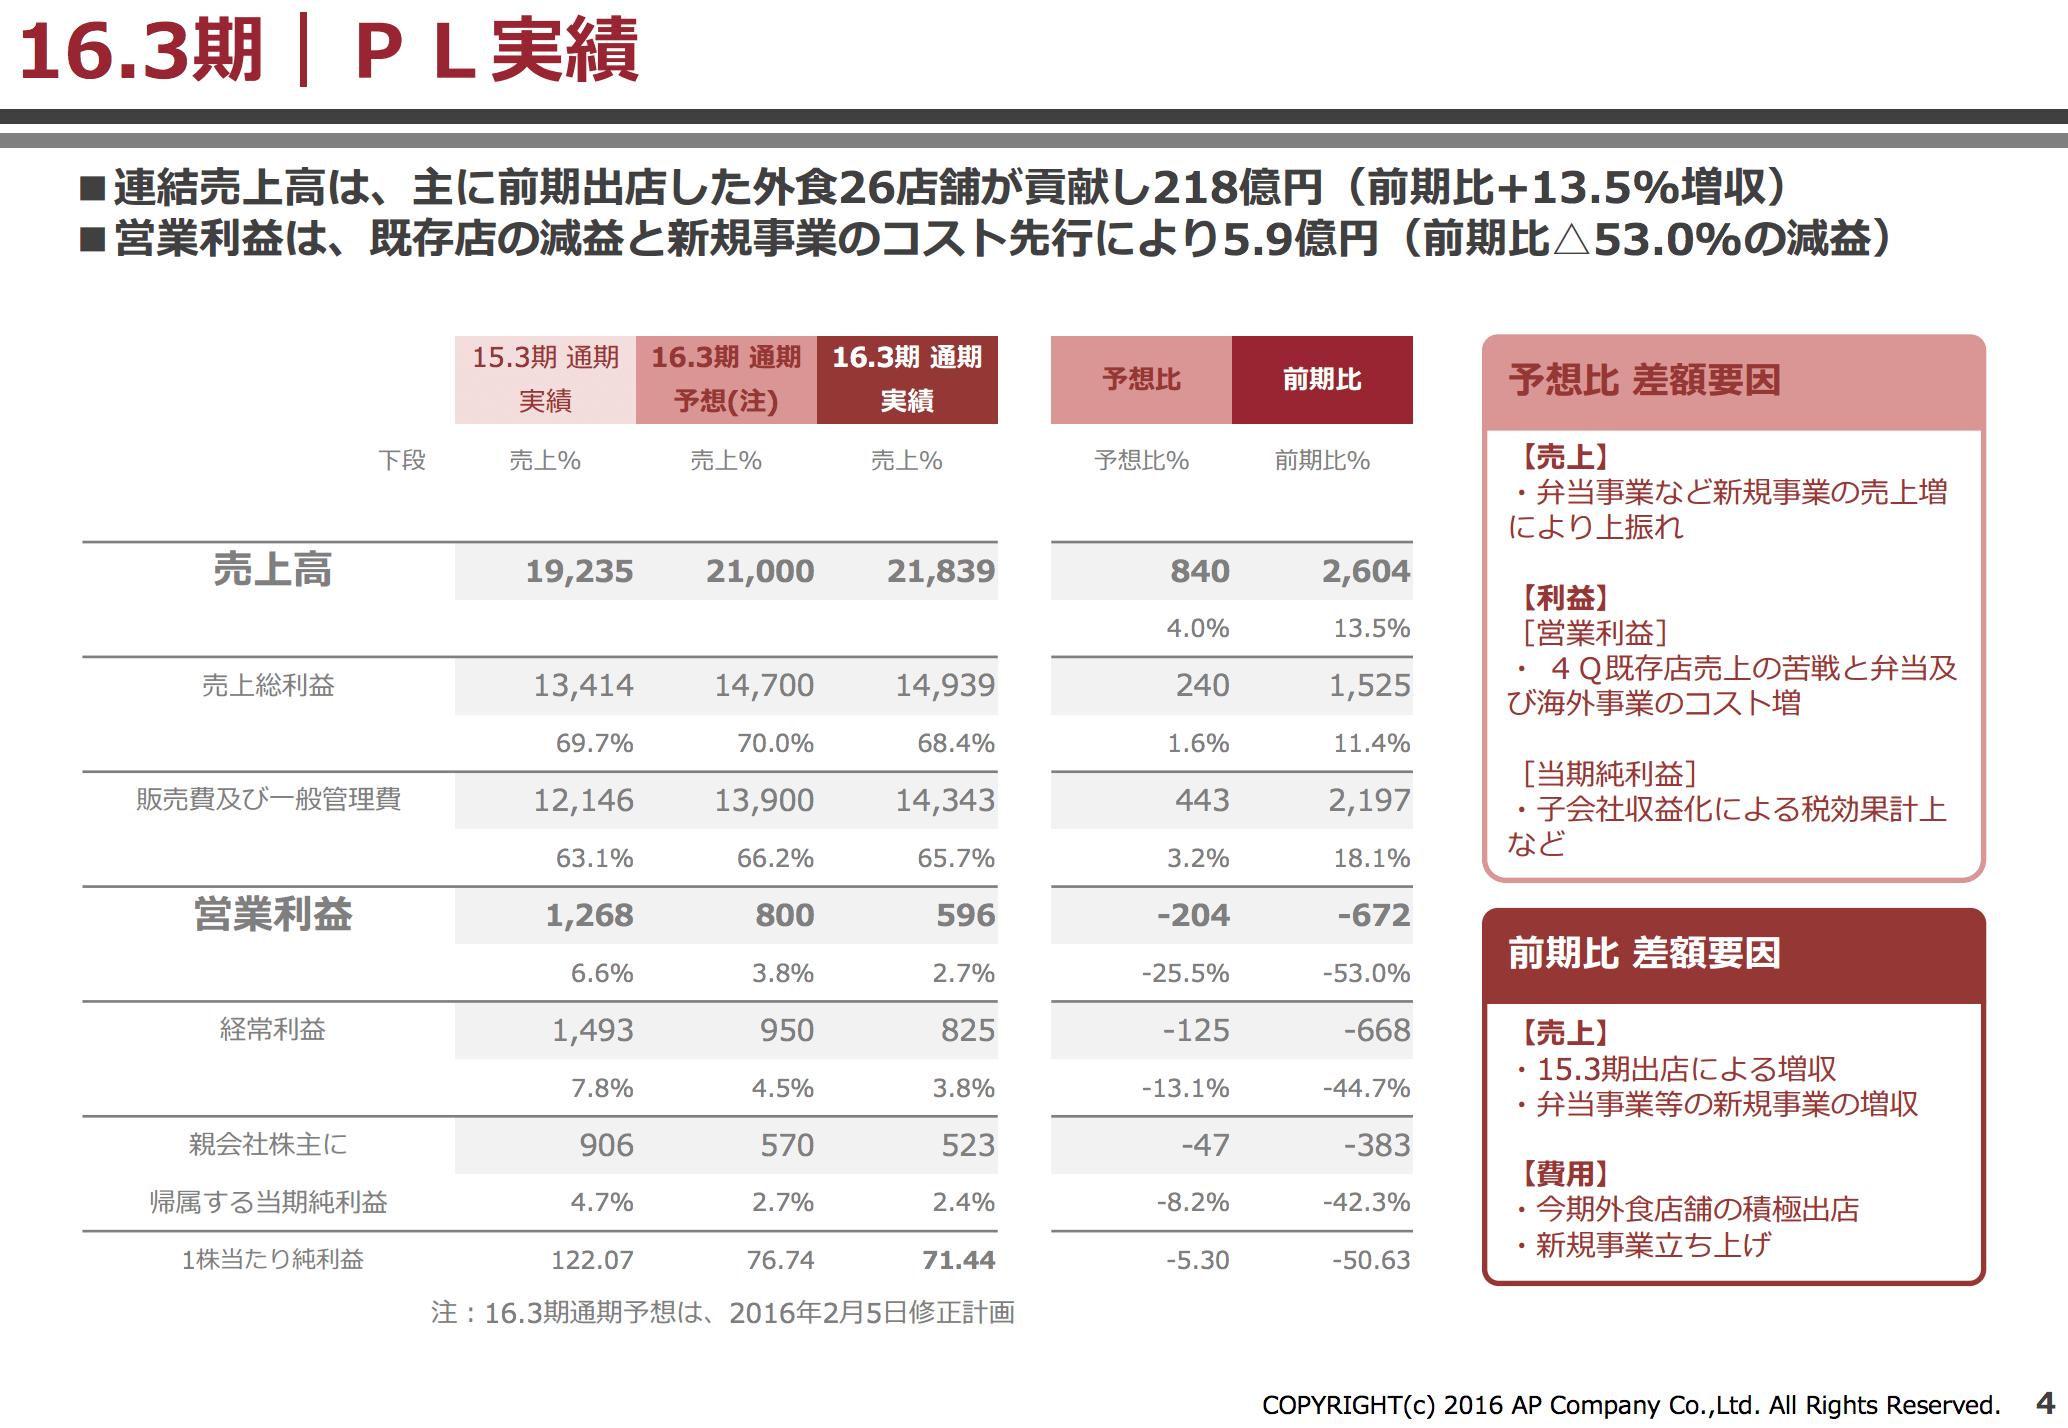 %e9%a3%b2%e9%a3%9f%e5%a4%96%e9%a3%9f%e7%94%a3%e6%a5%ad200%e5%84%84%e3%81%ae%e5%a3%811